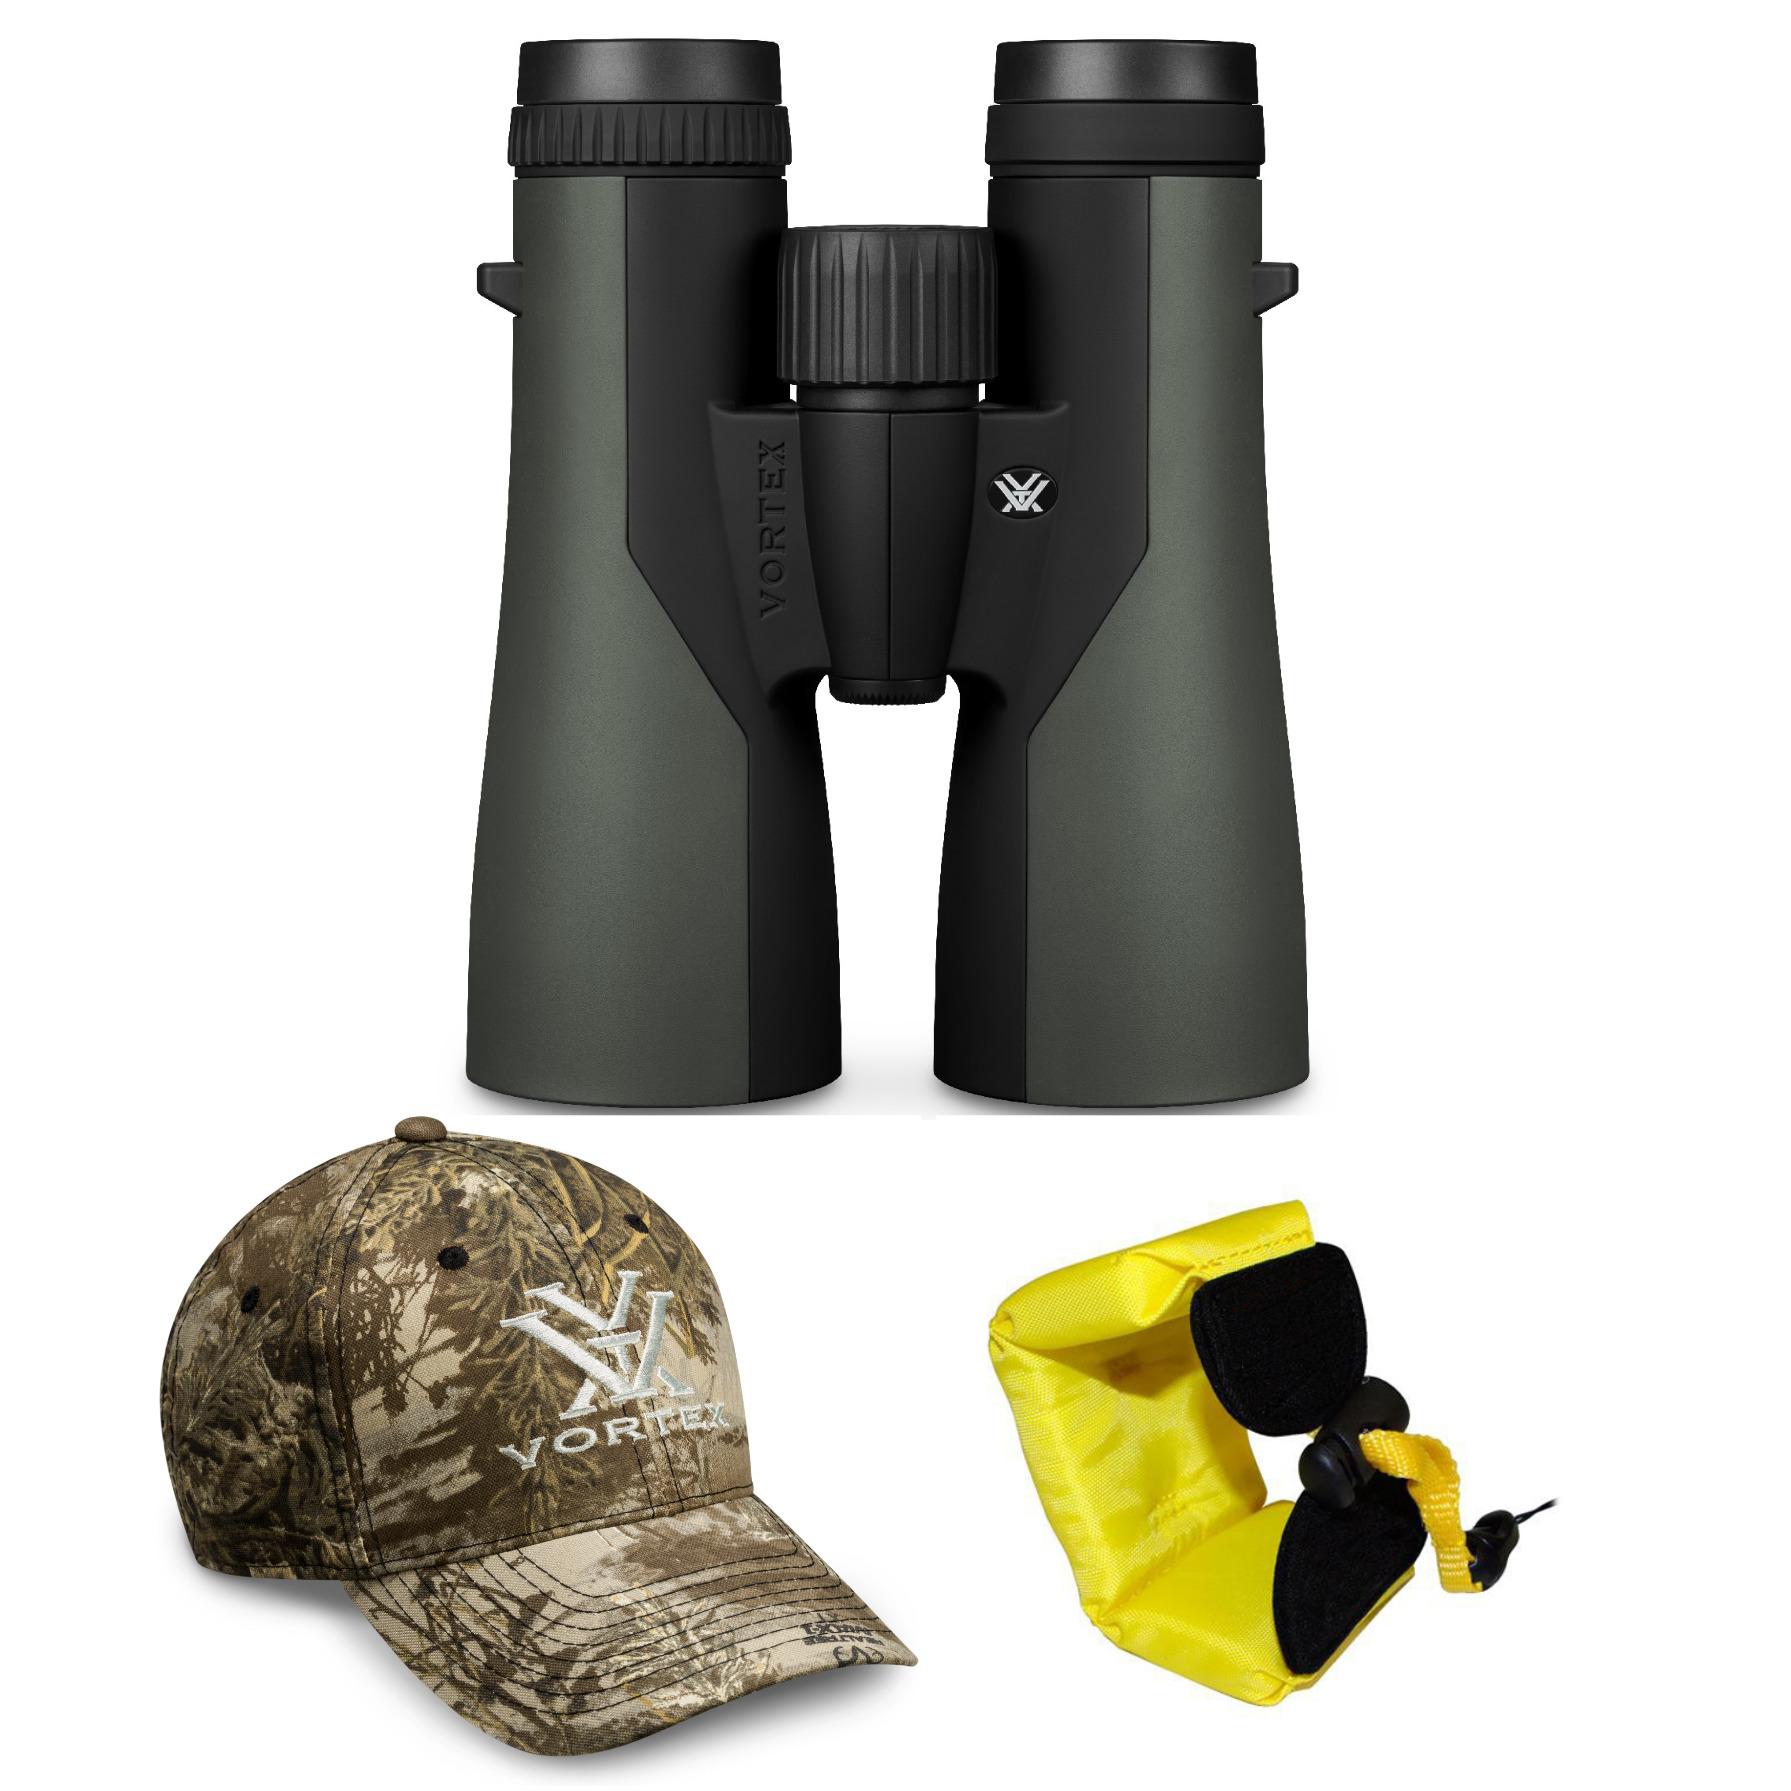 Vortex Optics Crossfire 10x50 Roof Prism Binoculars with Camera Strap Bundle